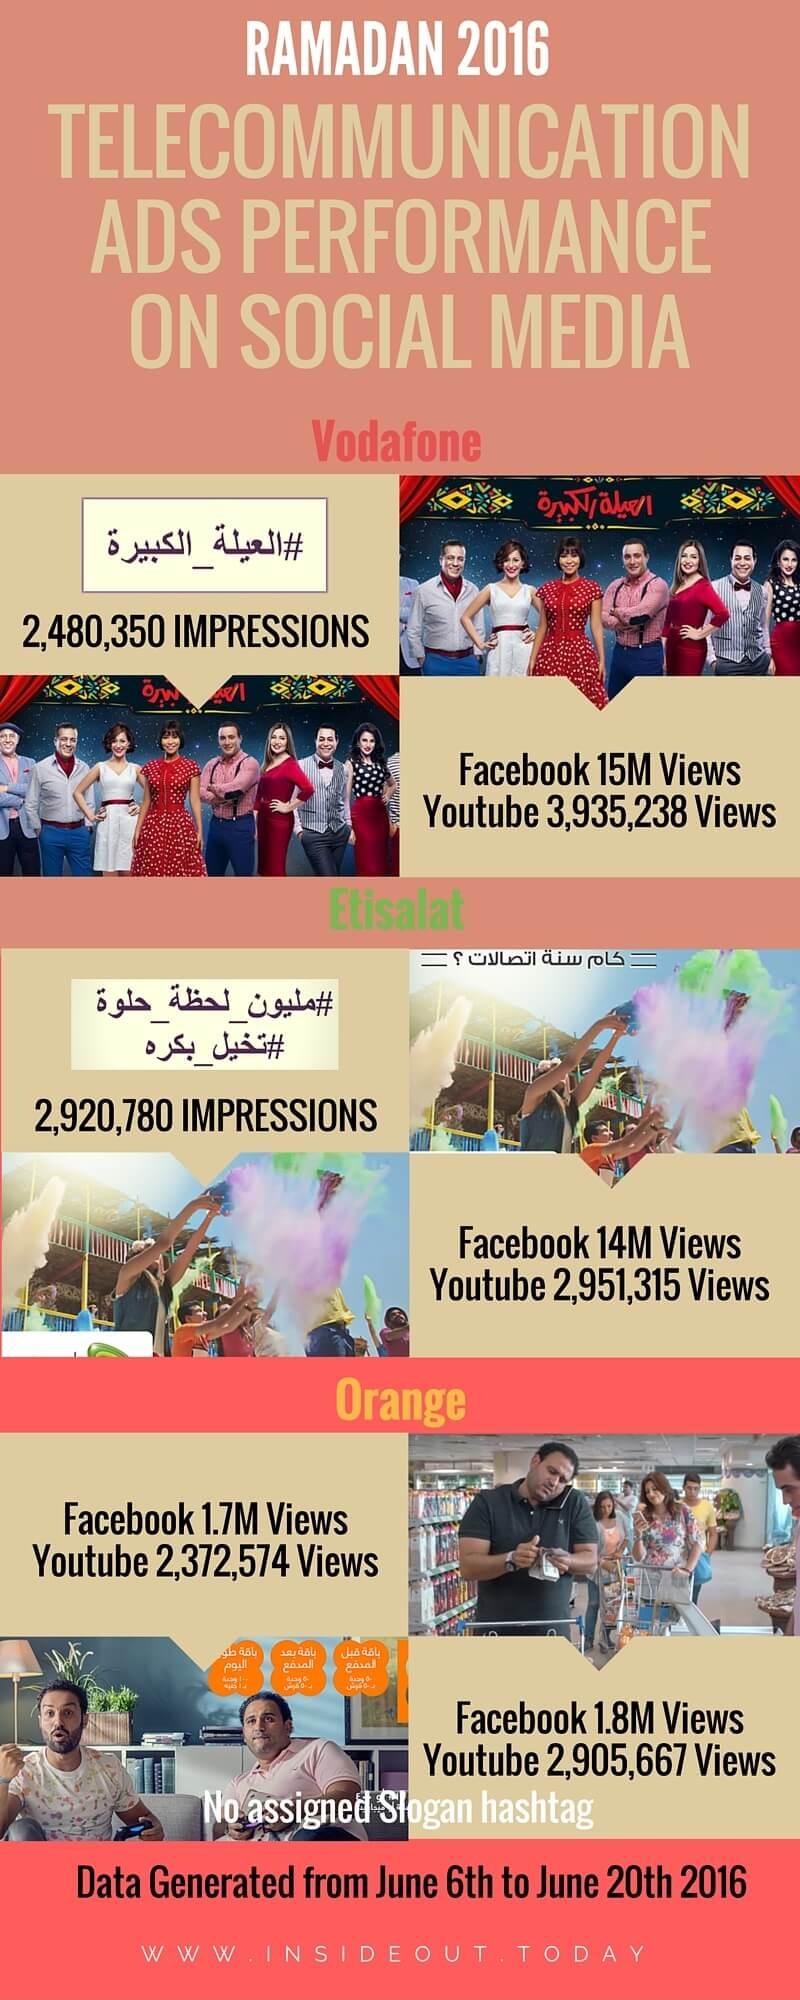 Ramadan Infographic 2